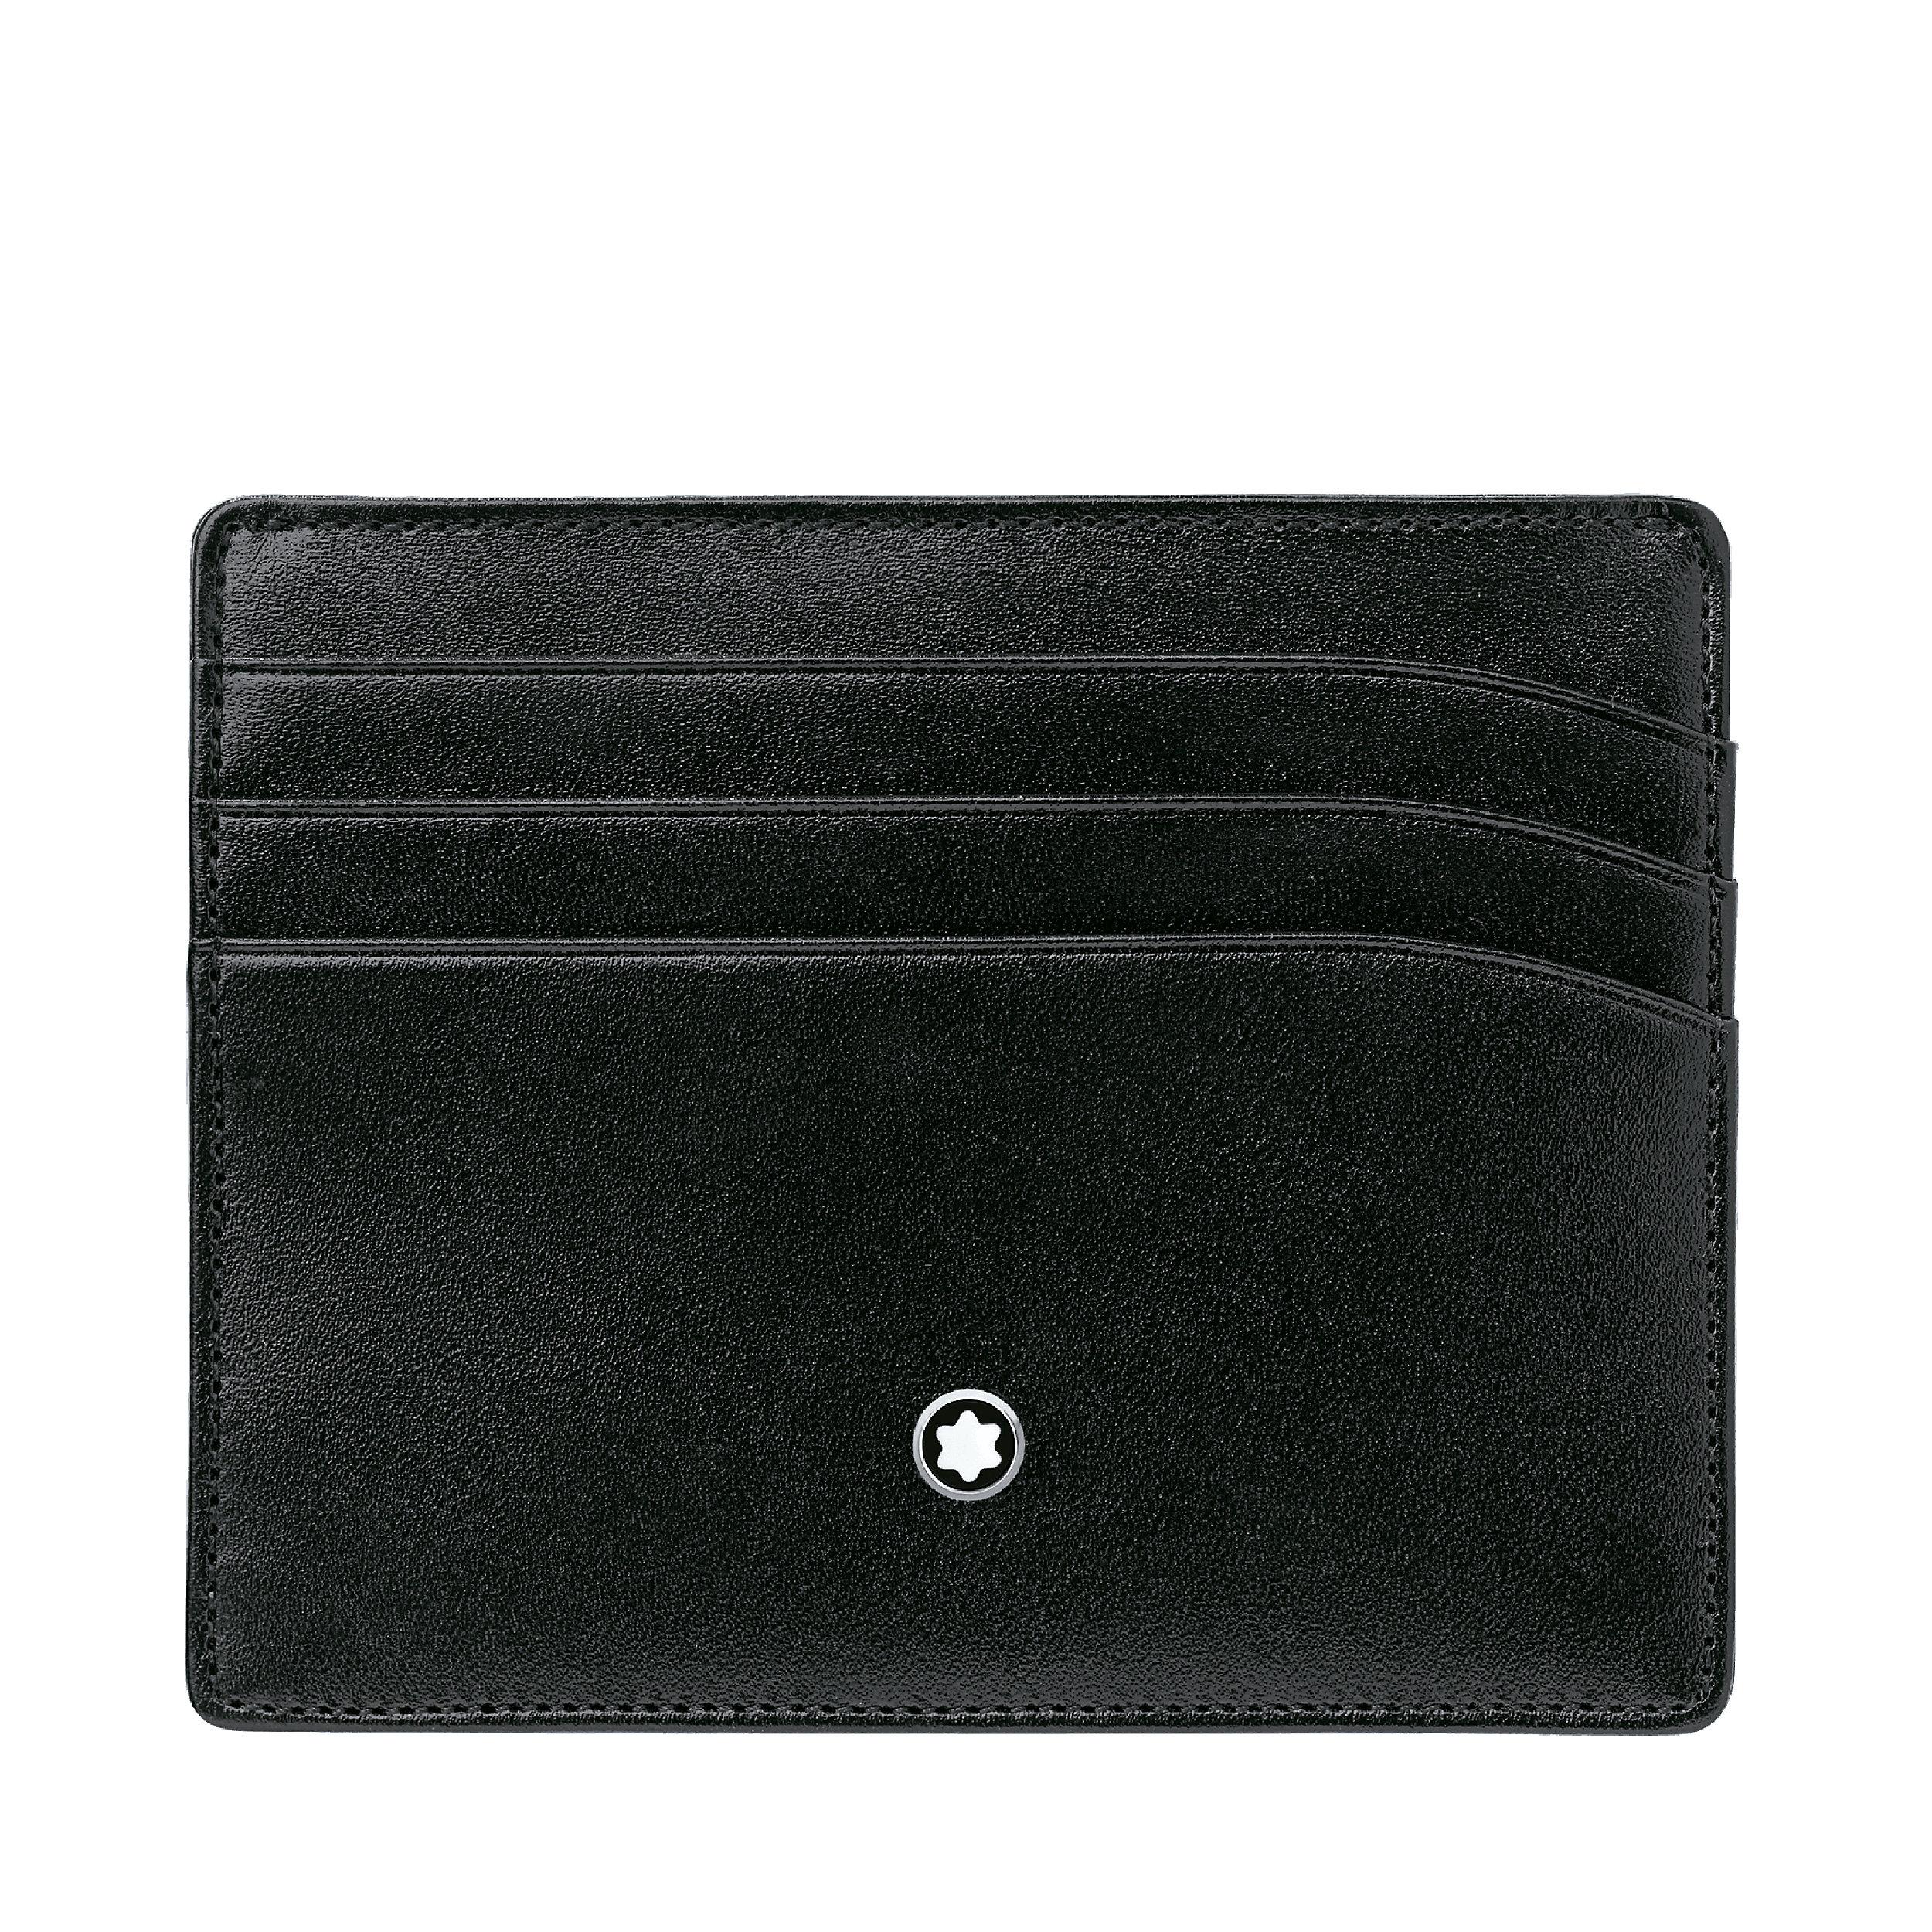 Kreditkartenetui Pocket 6KK Meisterstück